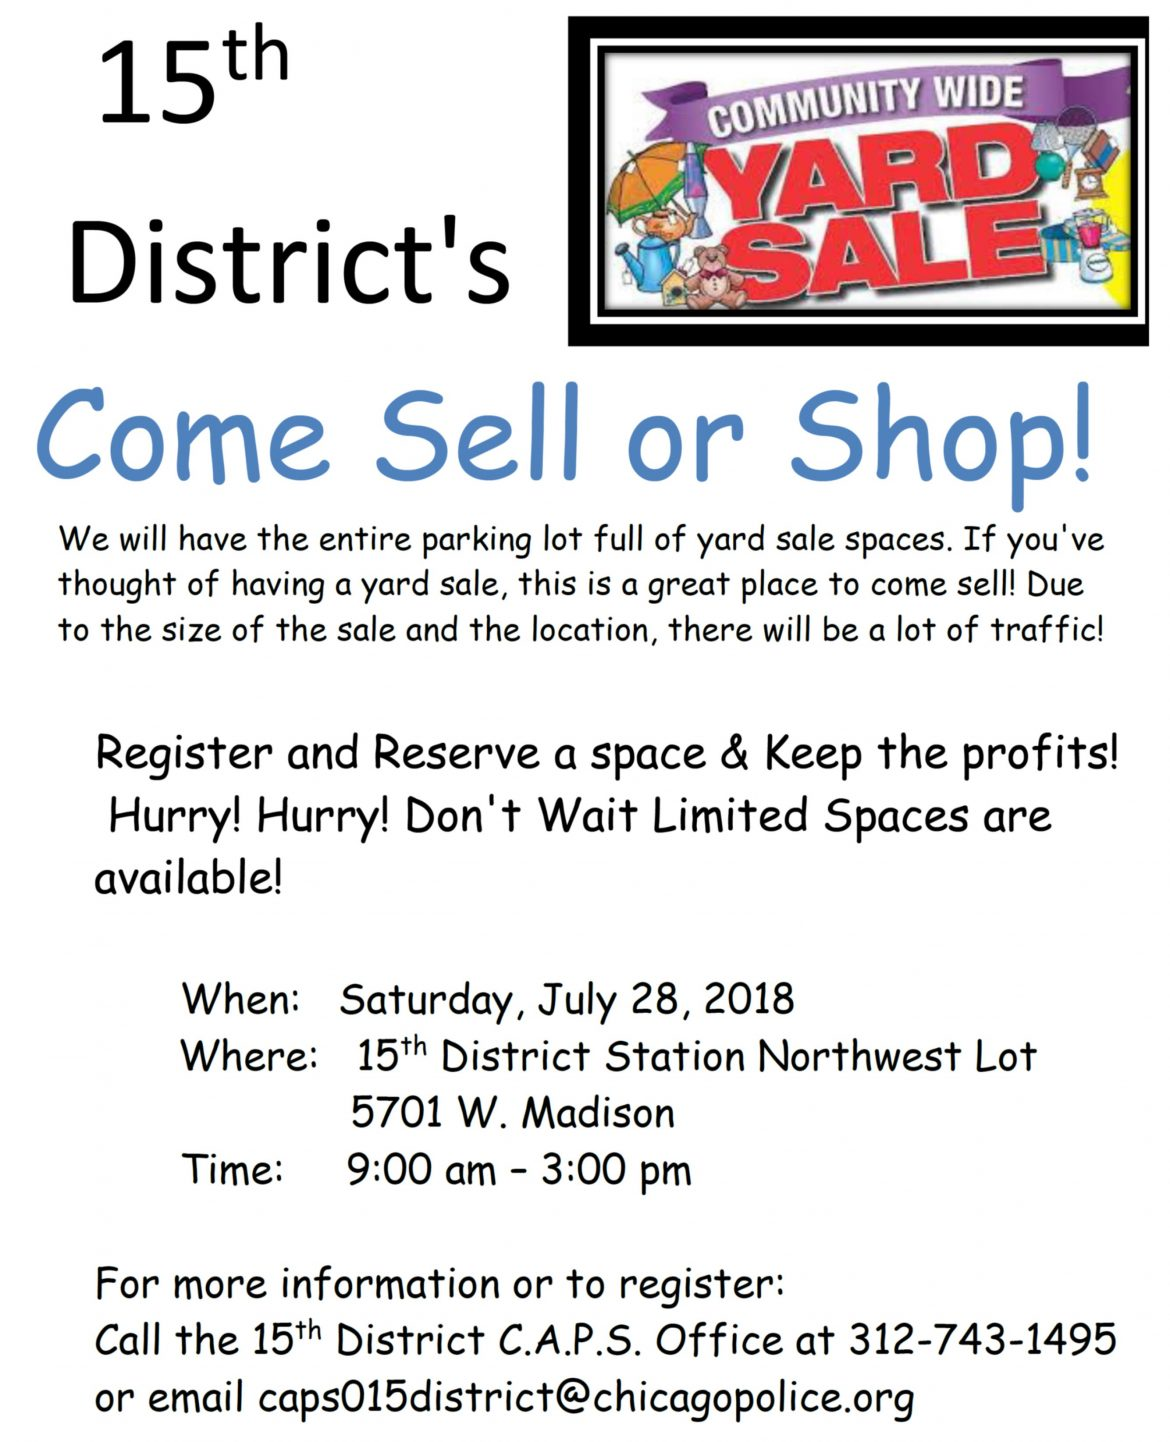 Sell, shop at 15th District garage sale Saturday   AustinTalks